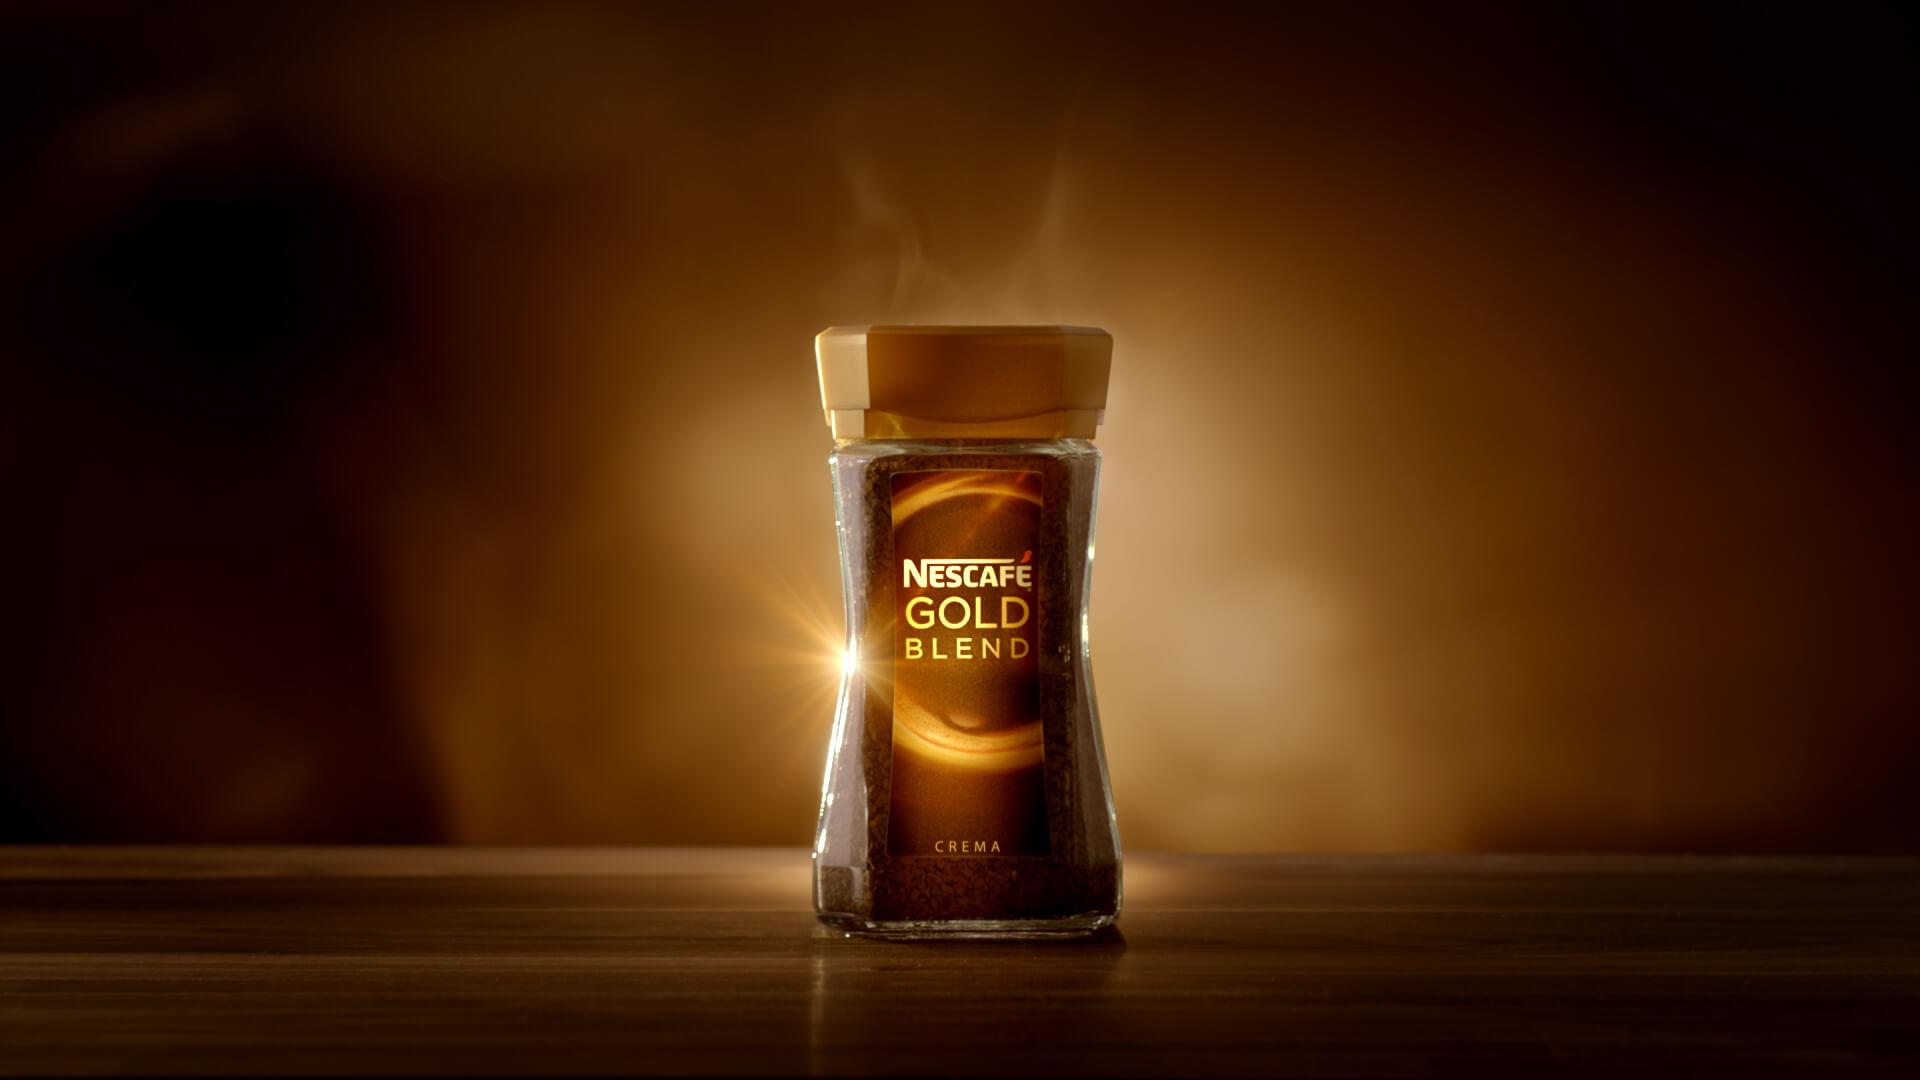 JP FRENAY  DIRECTOR  NESCAFE  Gold Blend  Crema